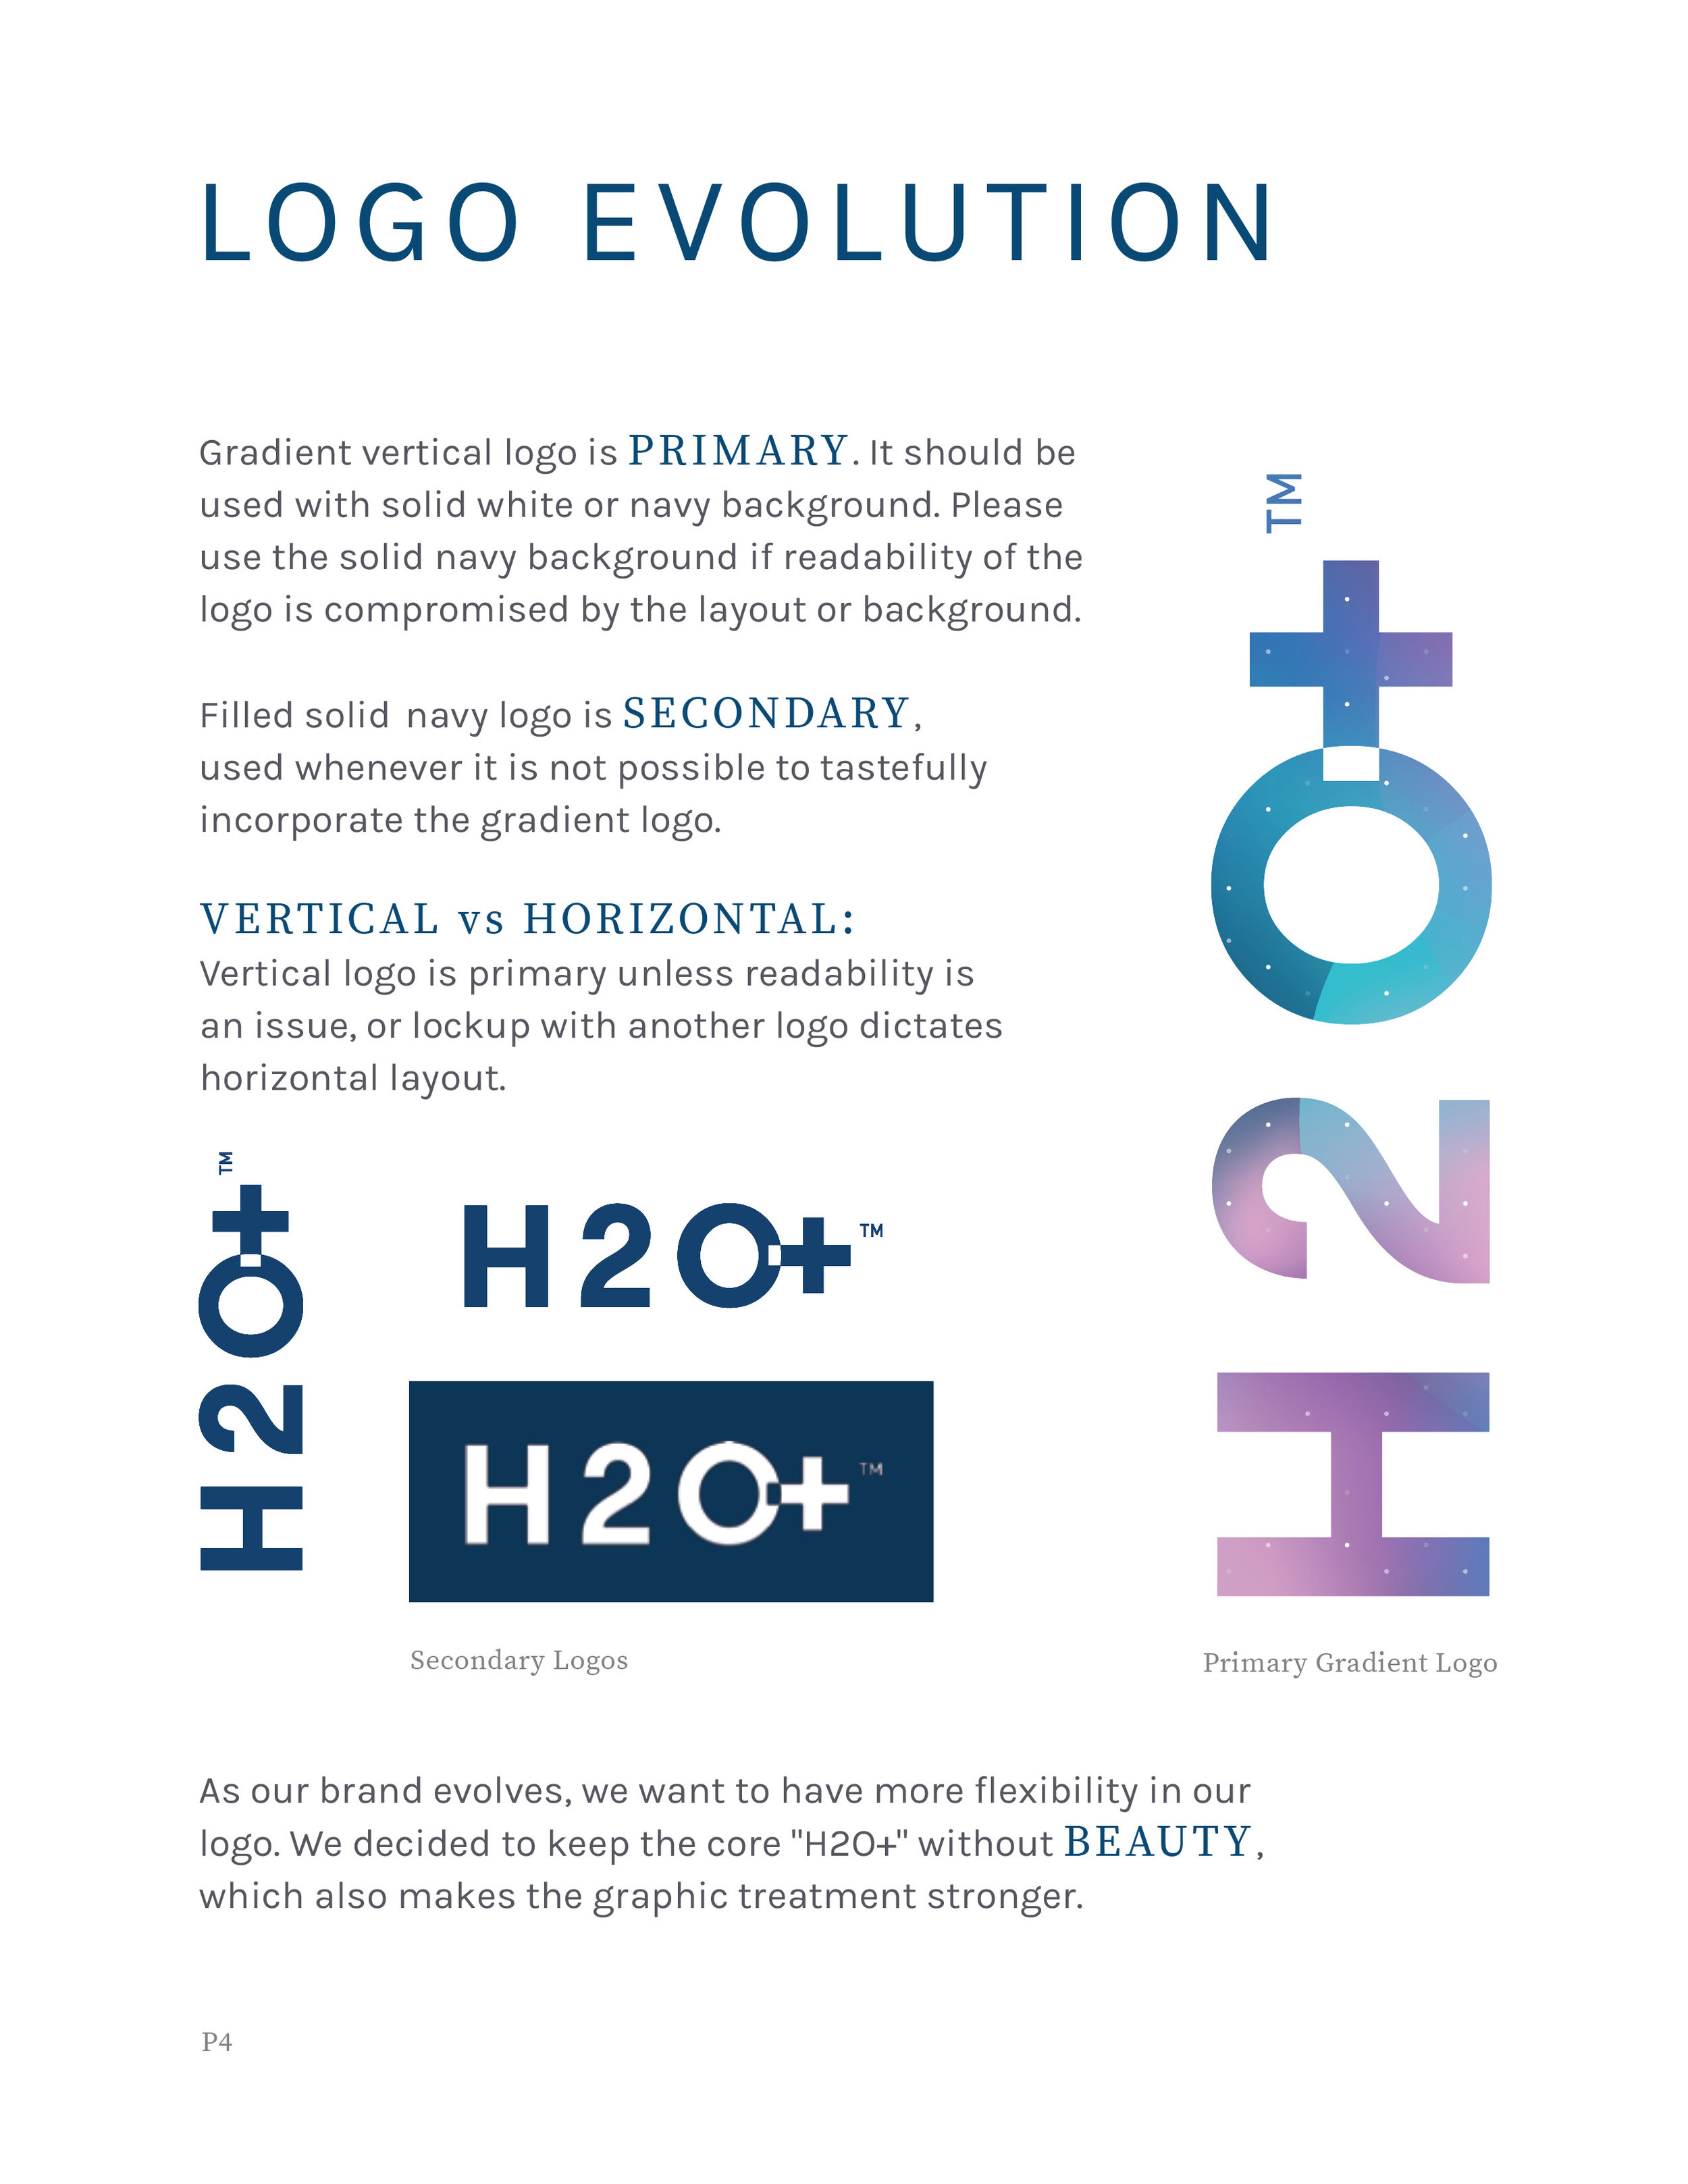 H2O+ Brand Style Guide_0405194.jpg